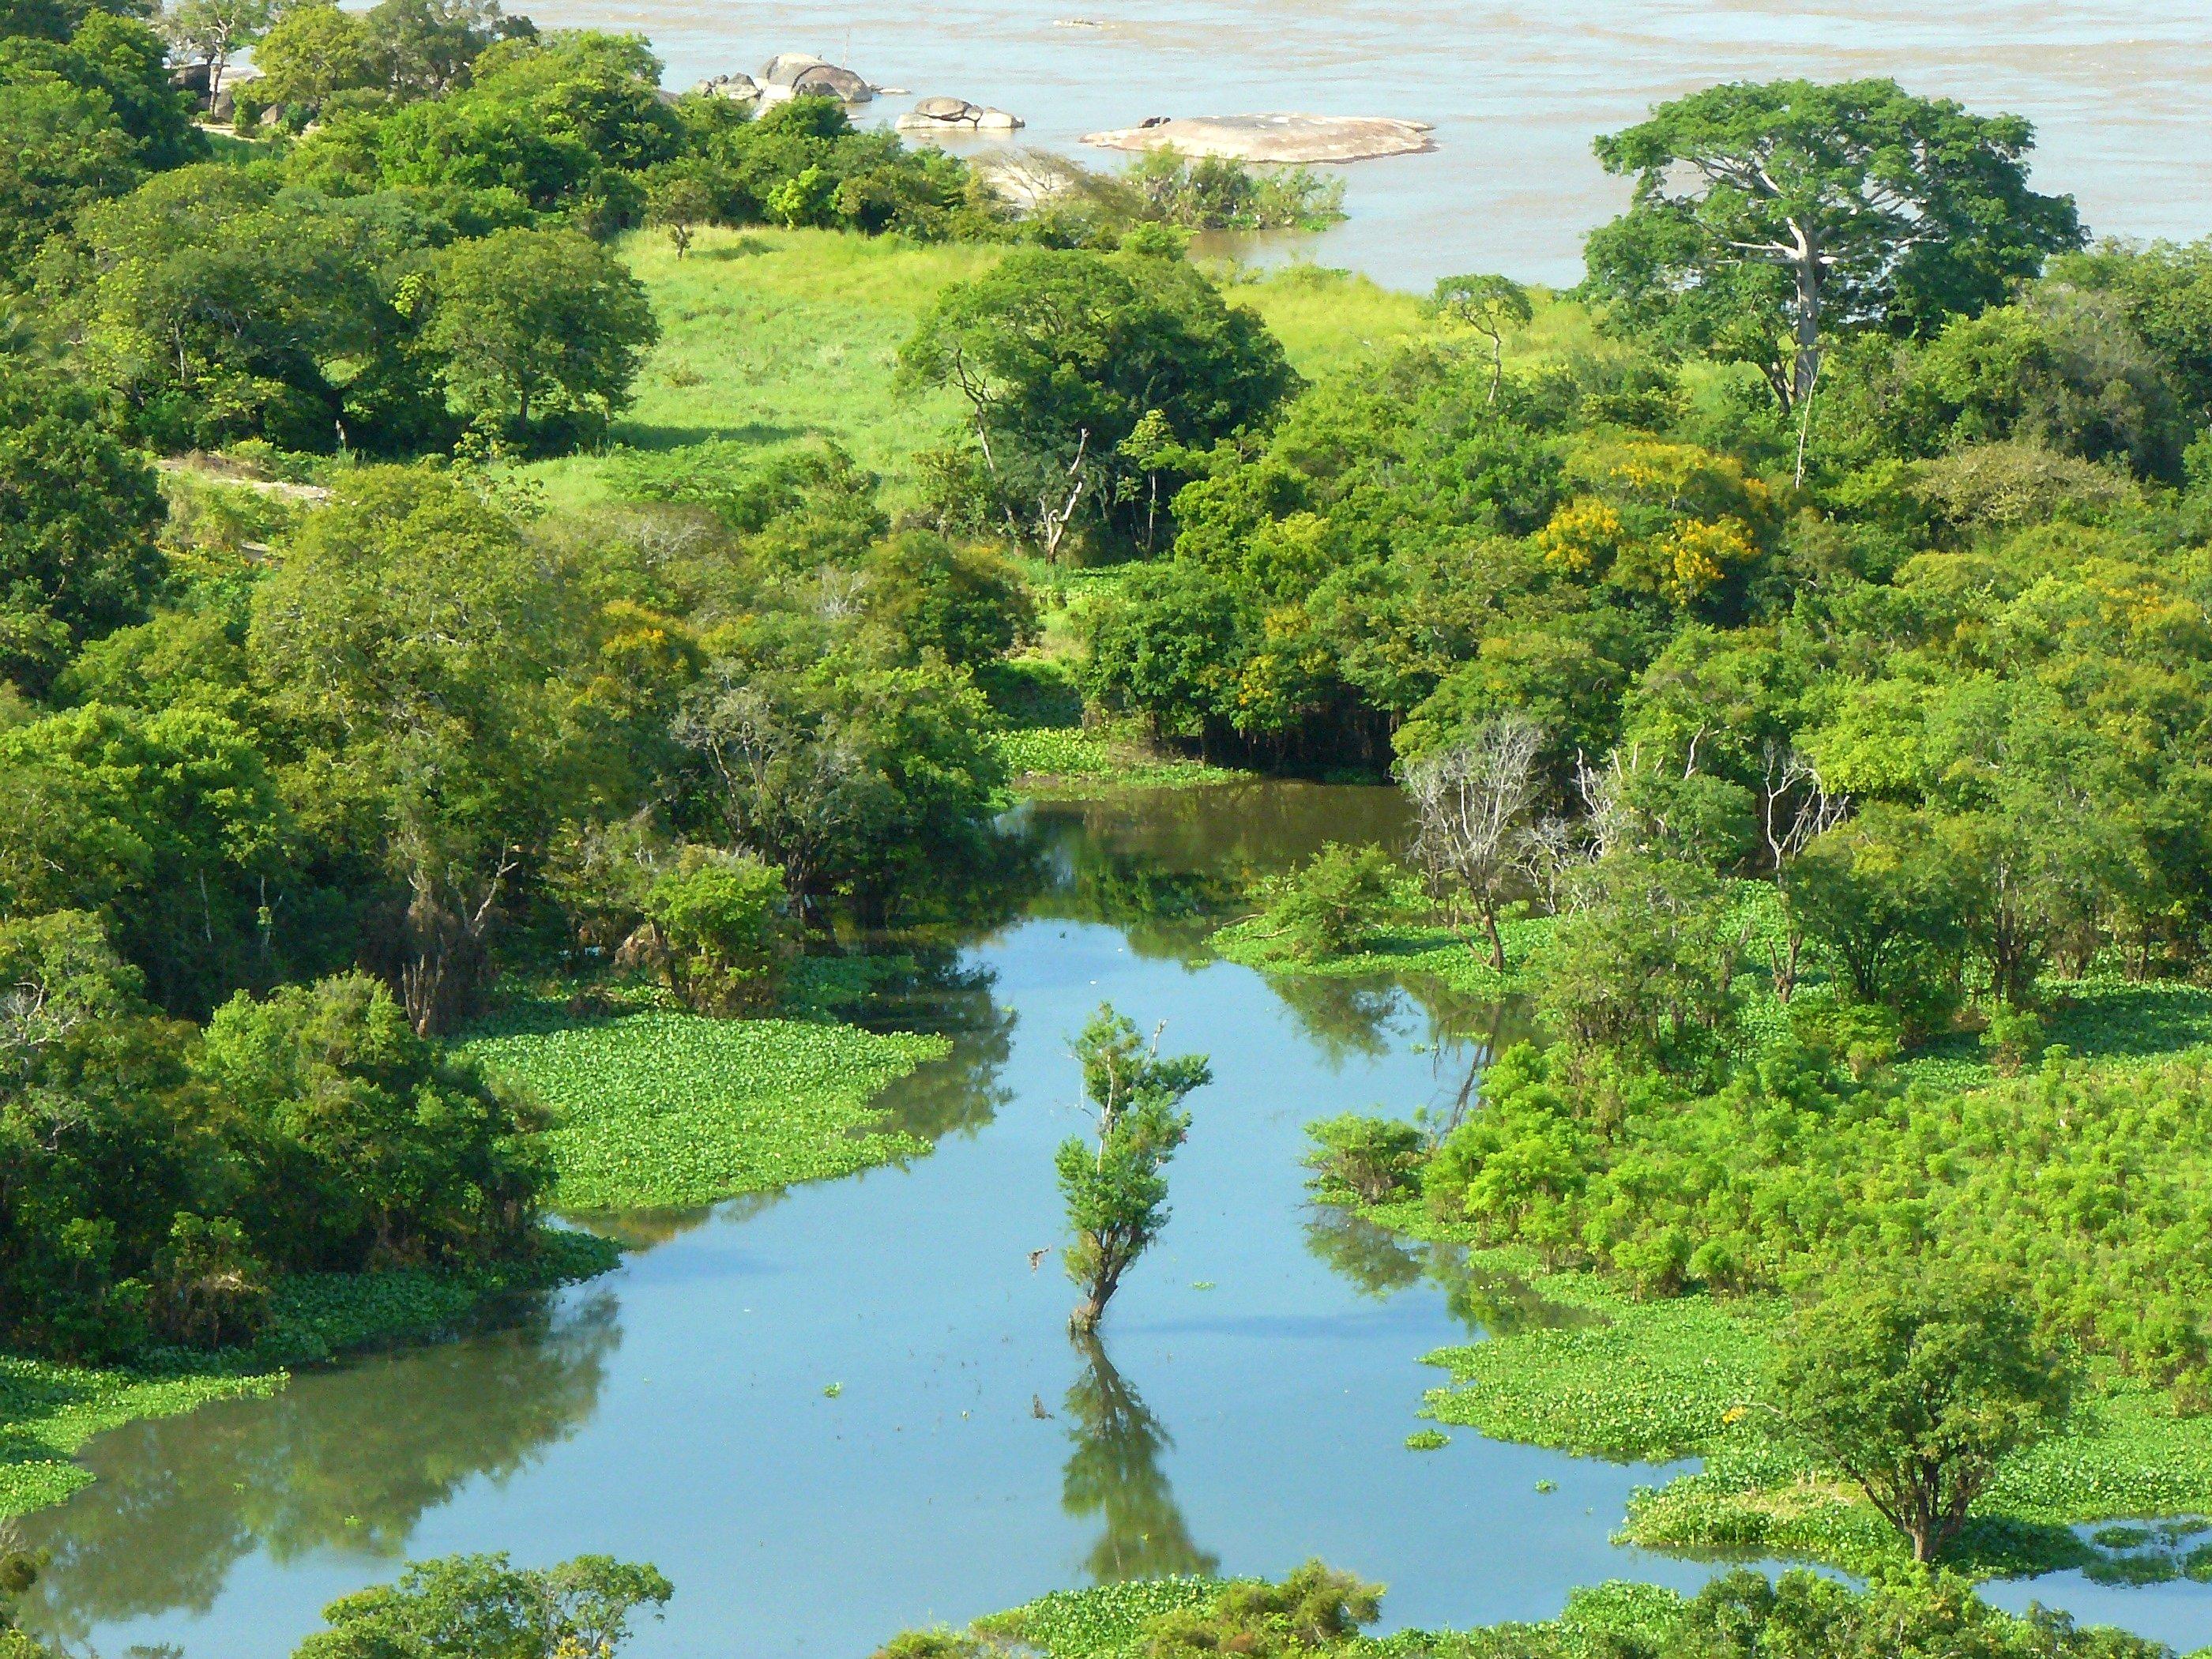 Orinoco River File:Orinoco4.j...